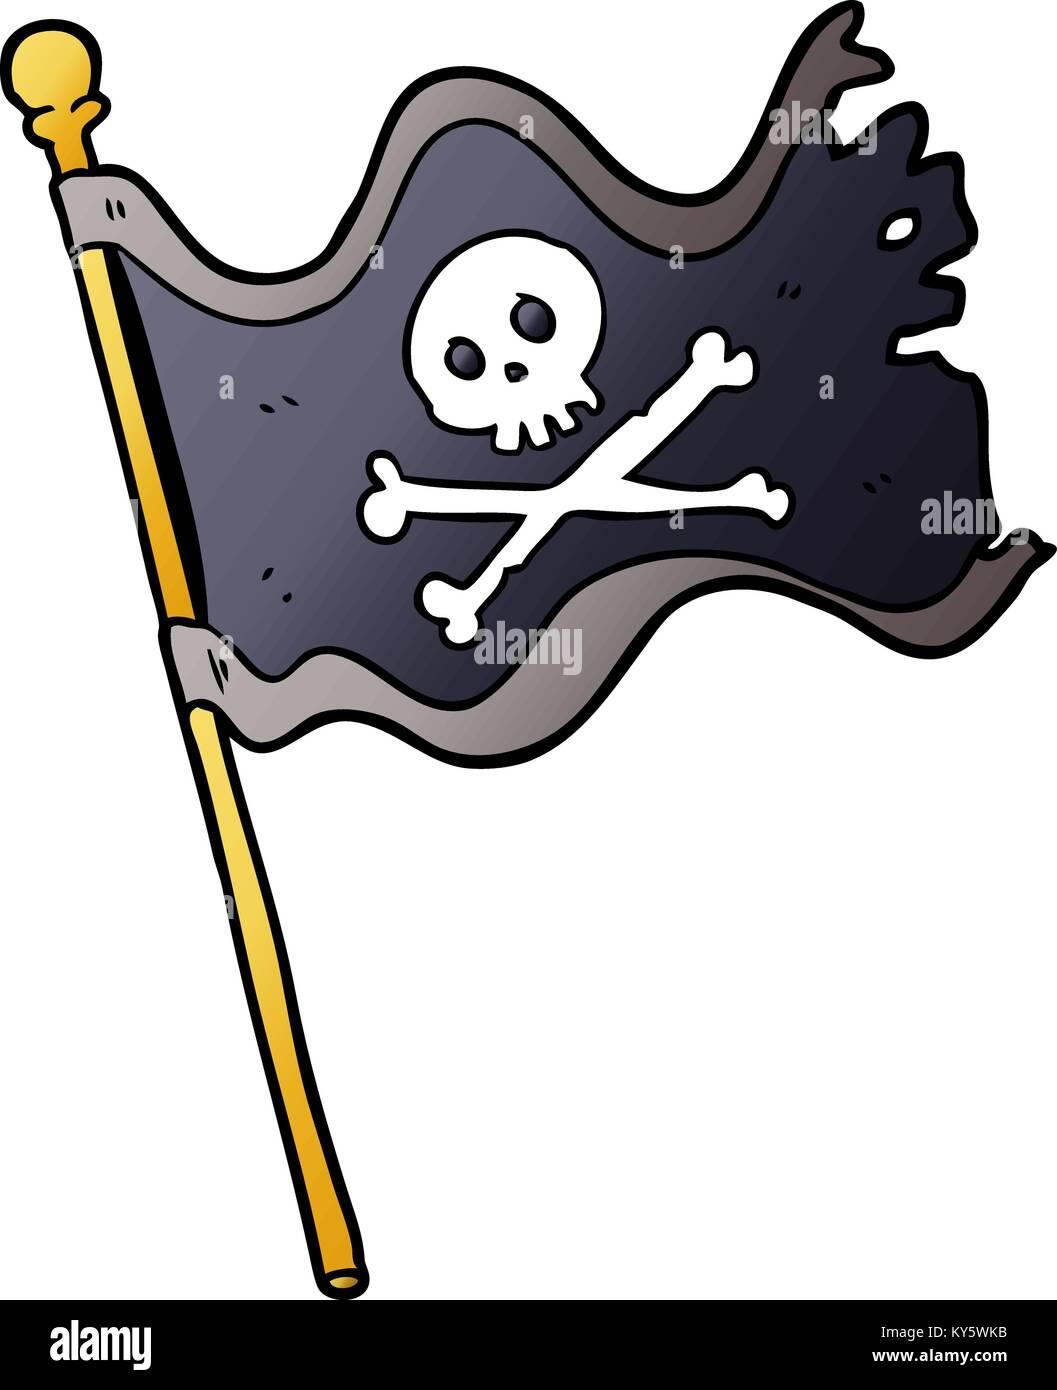 cartoon pirate flag stock vector art illustration vector image